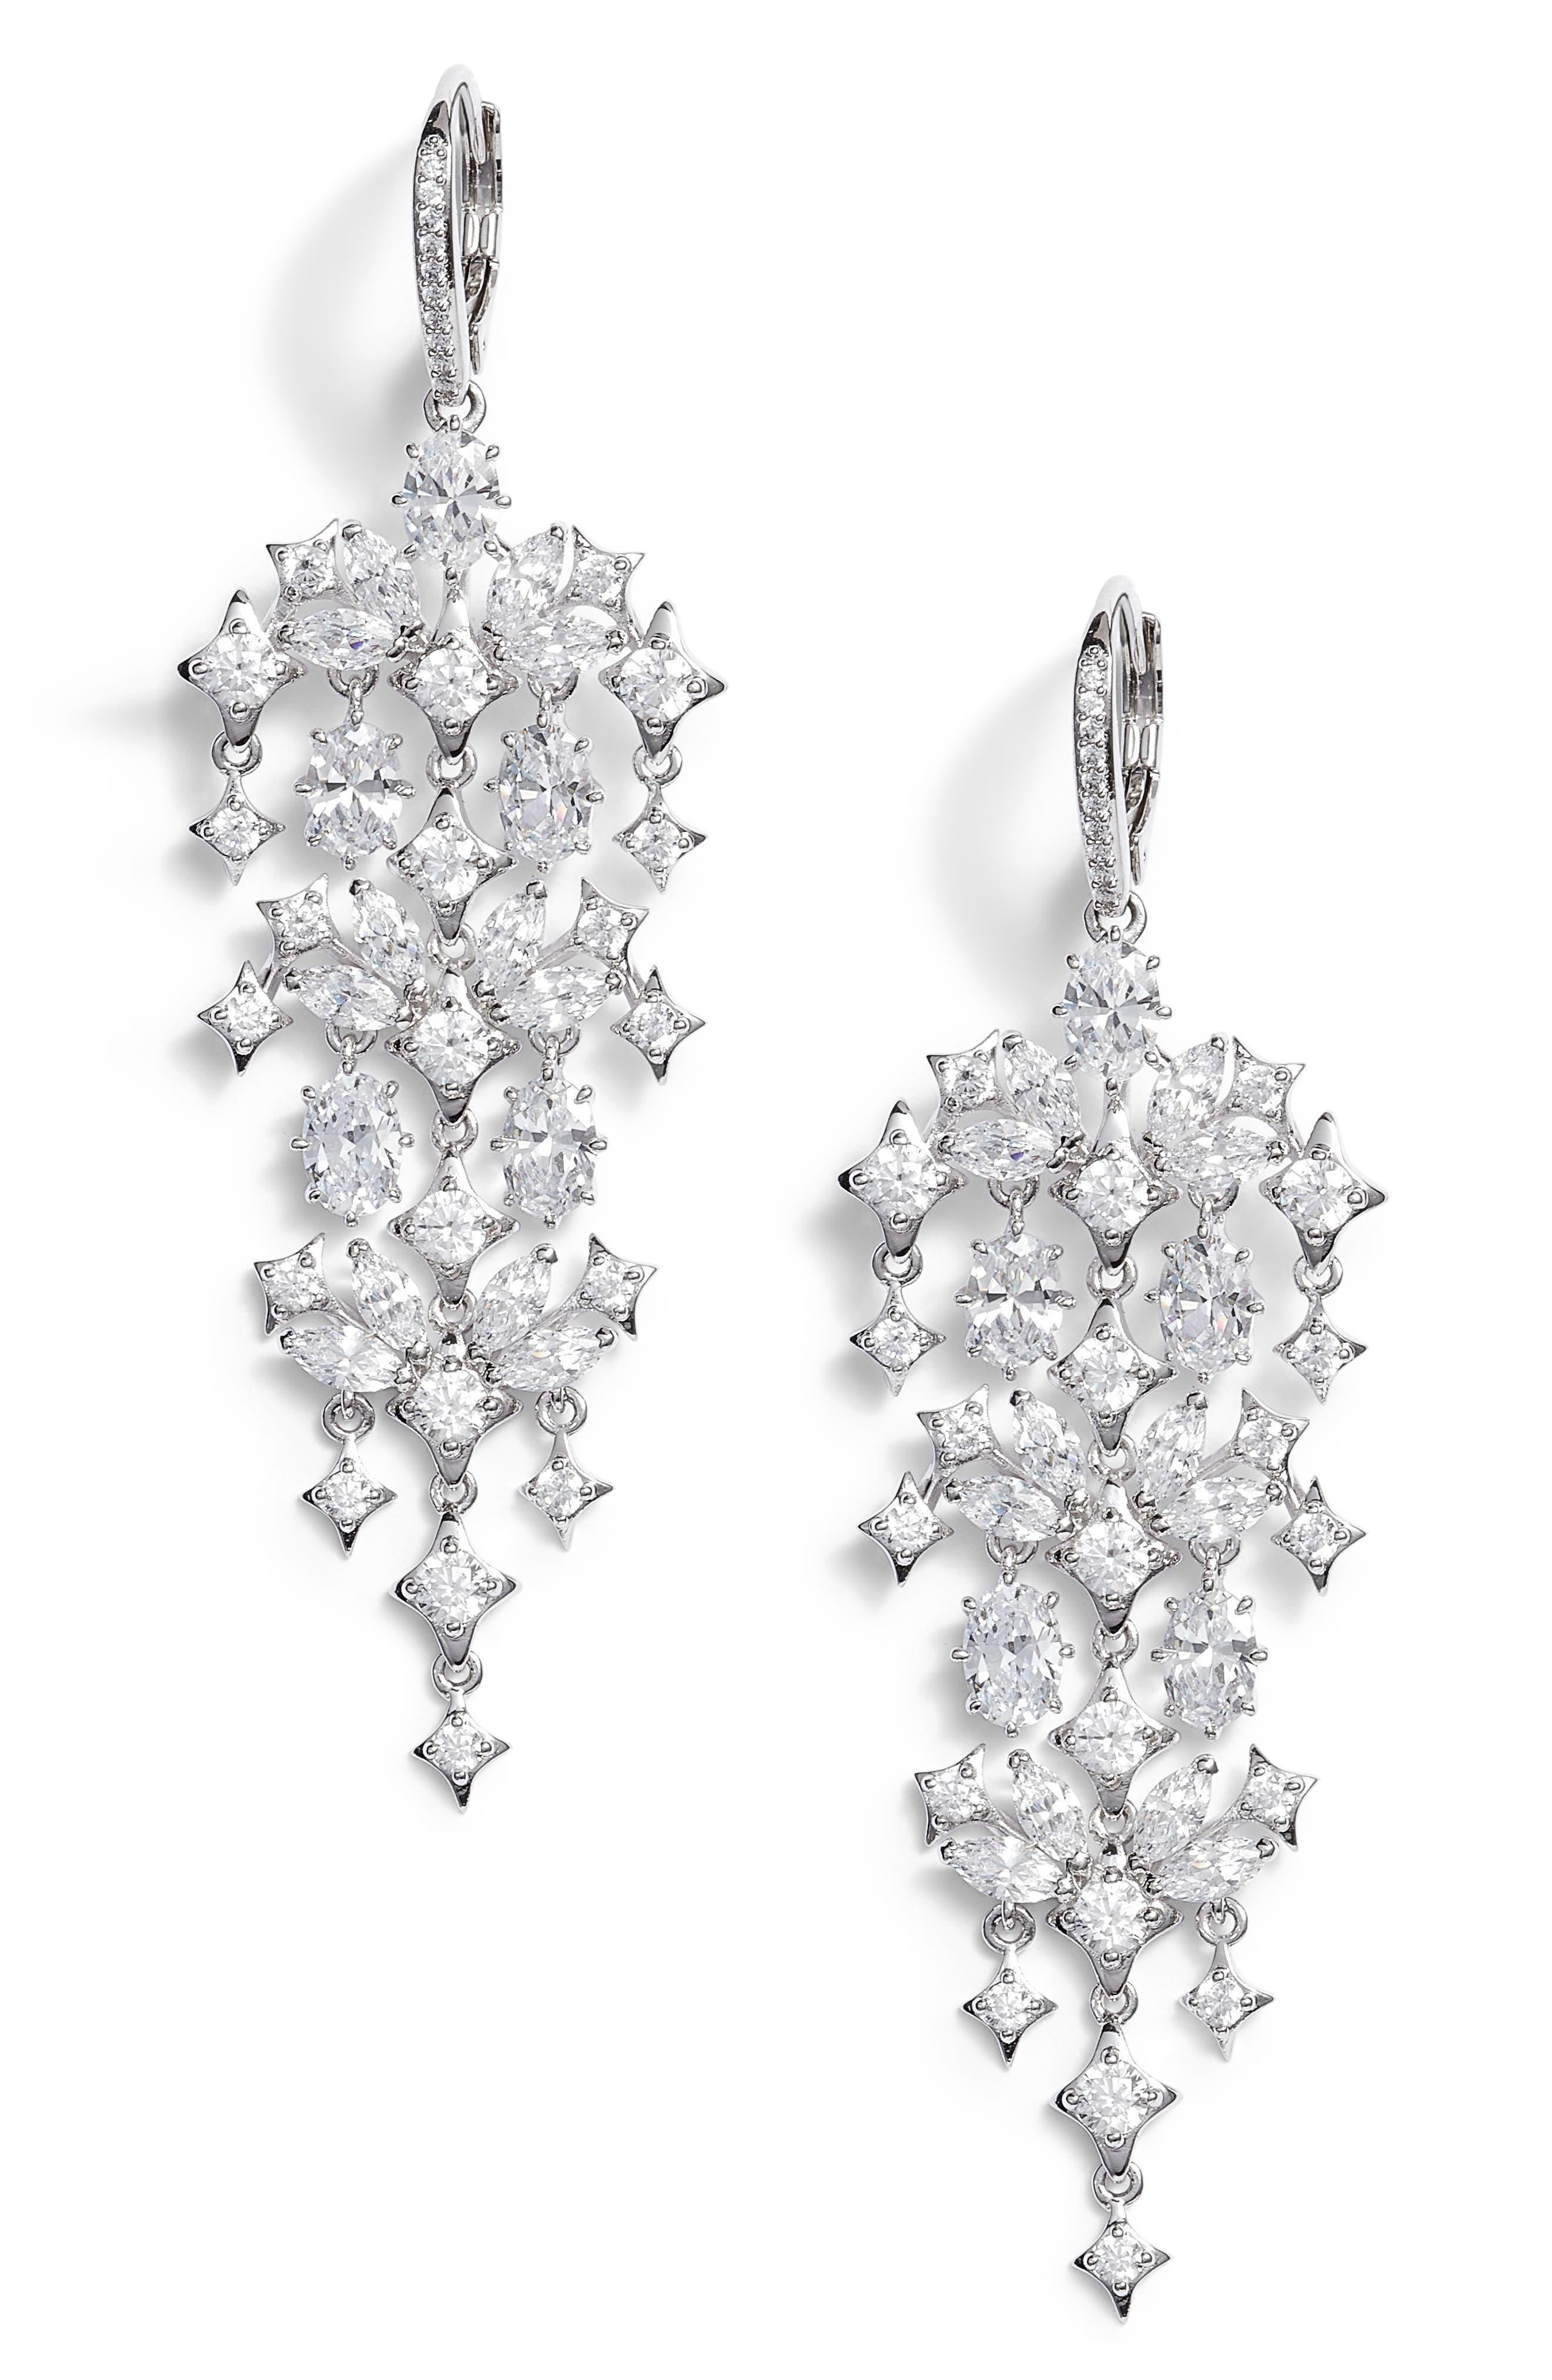 Boho Crystal Chandelier Earrings,                             Main thumbnail 1, color,                             Silver/ Clear